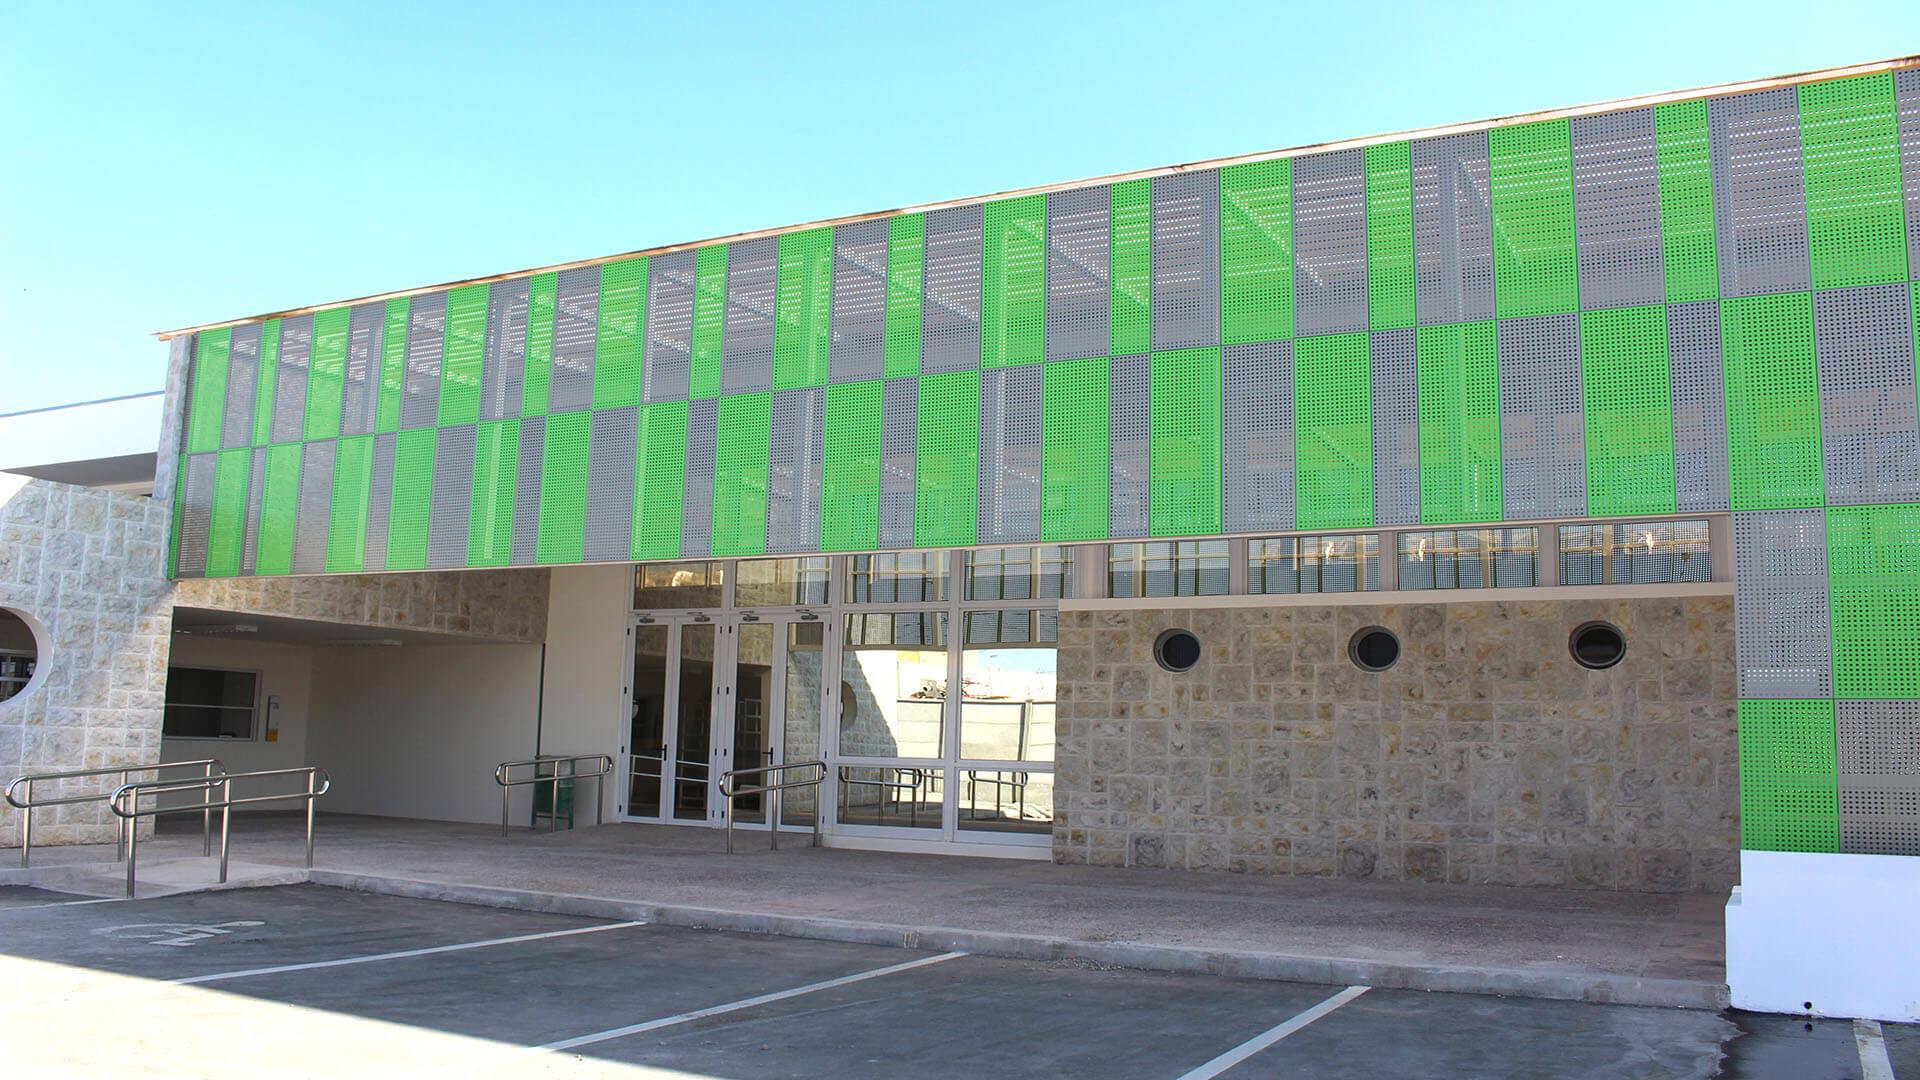 Obra-Terminada-Cesfam-El-Sauce-Coquimbo-Constructora-Rencoret-9